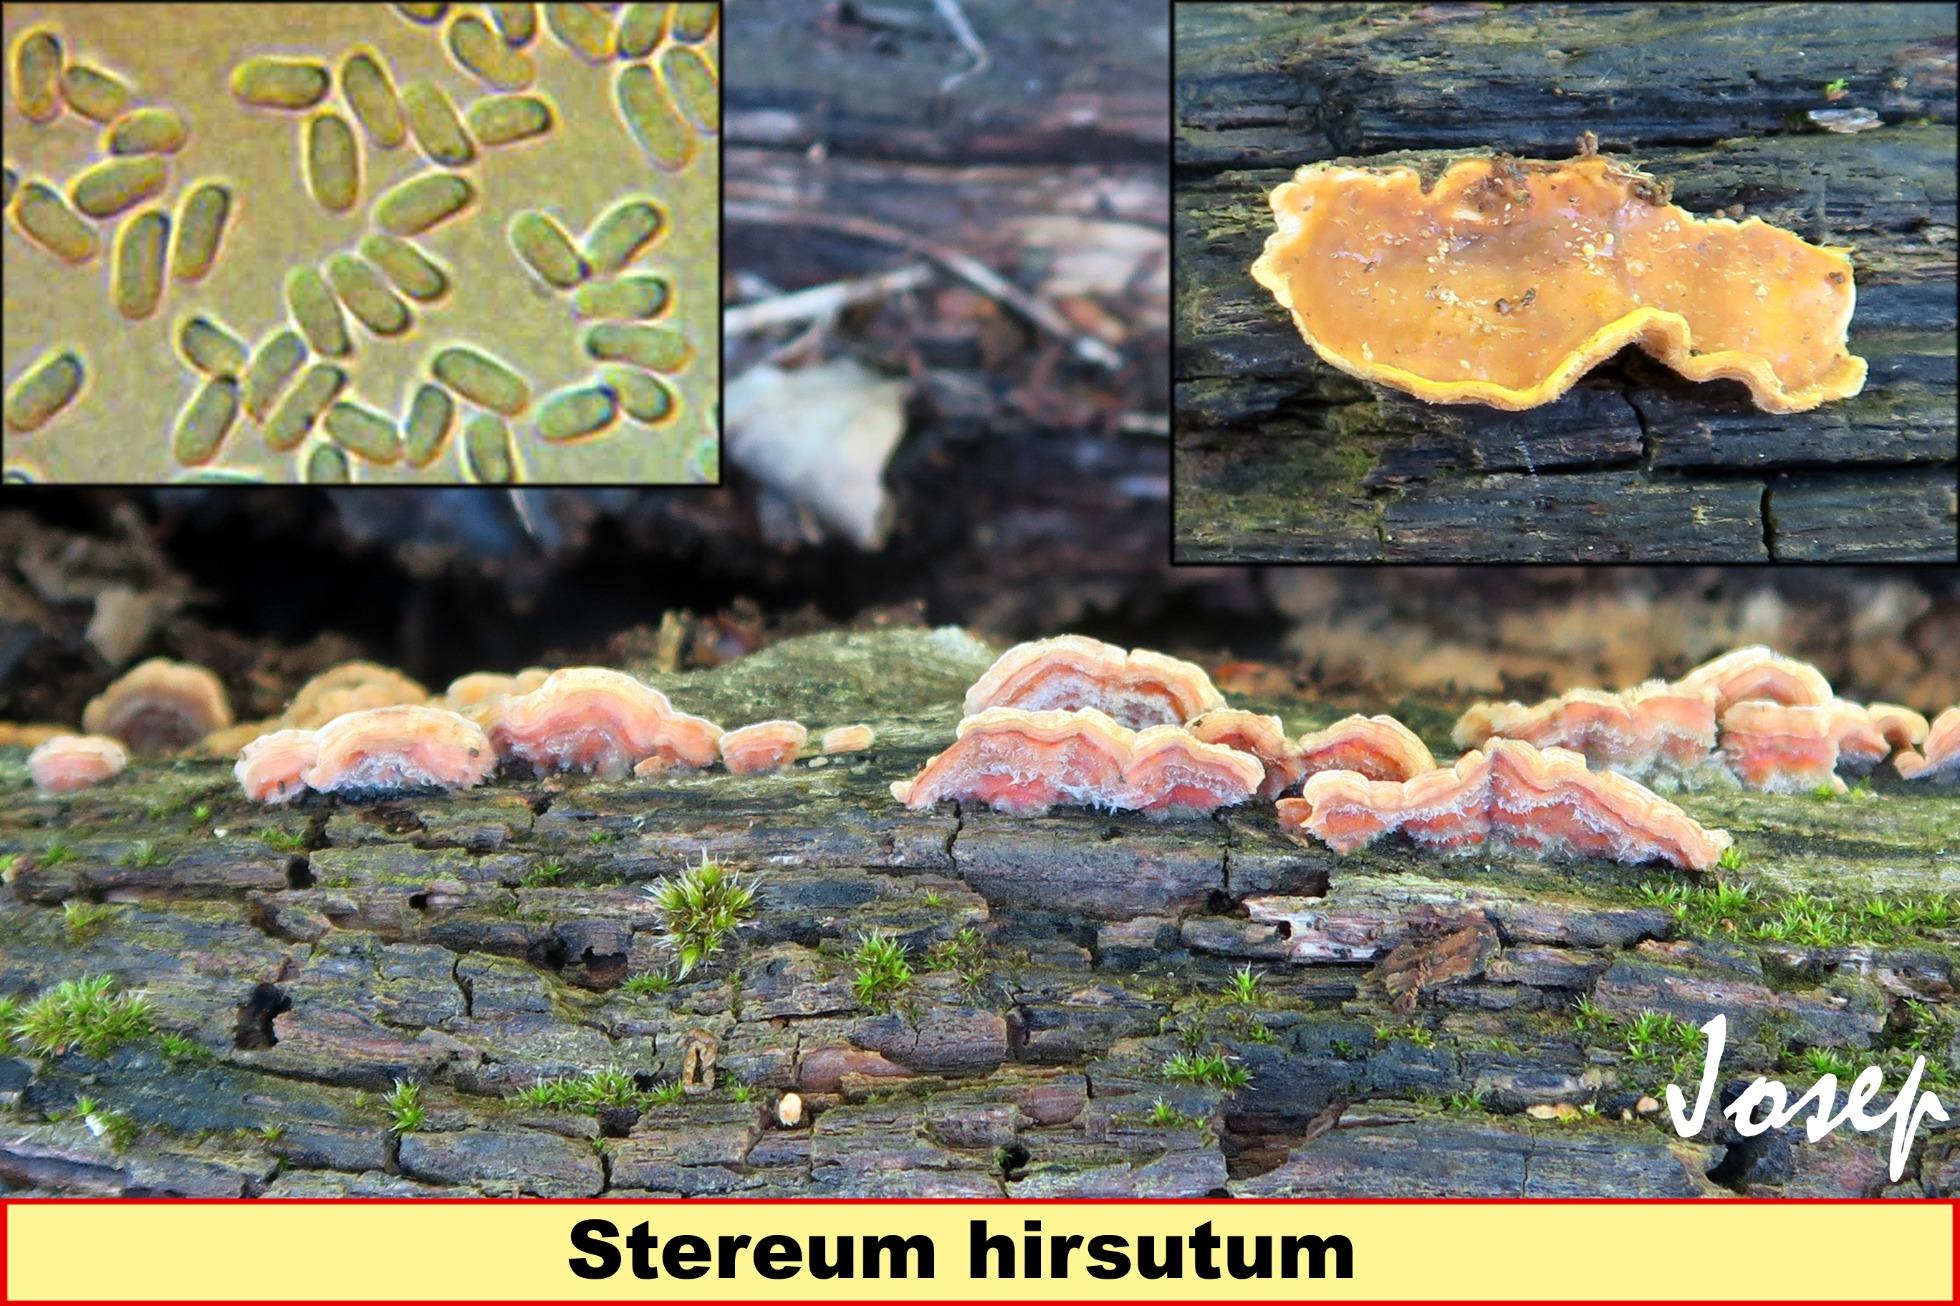 Stereumhirsutum20.jpg